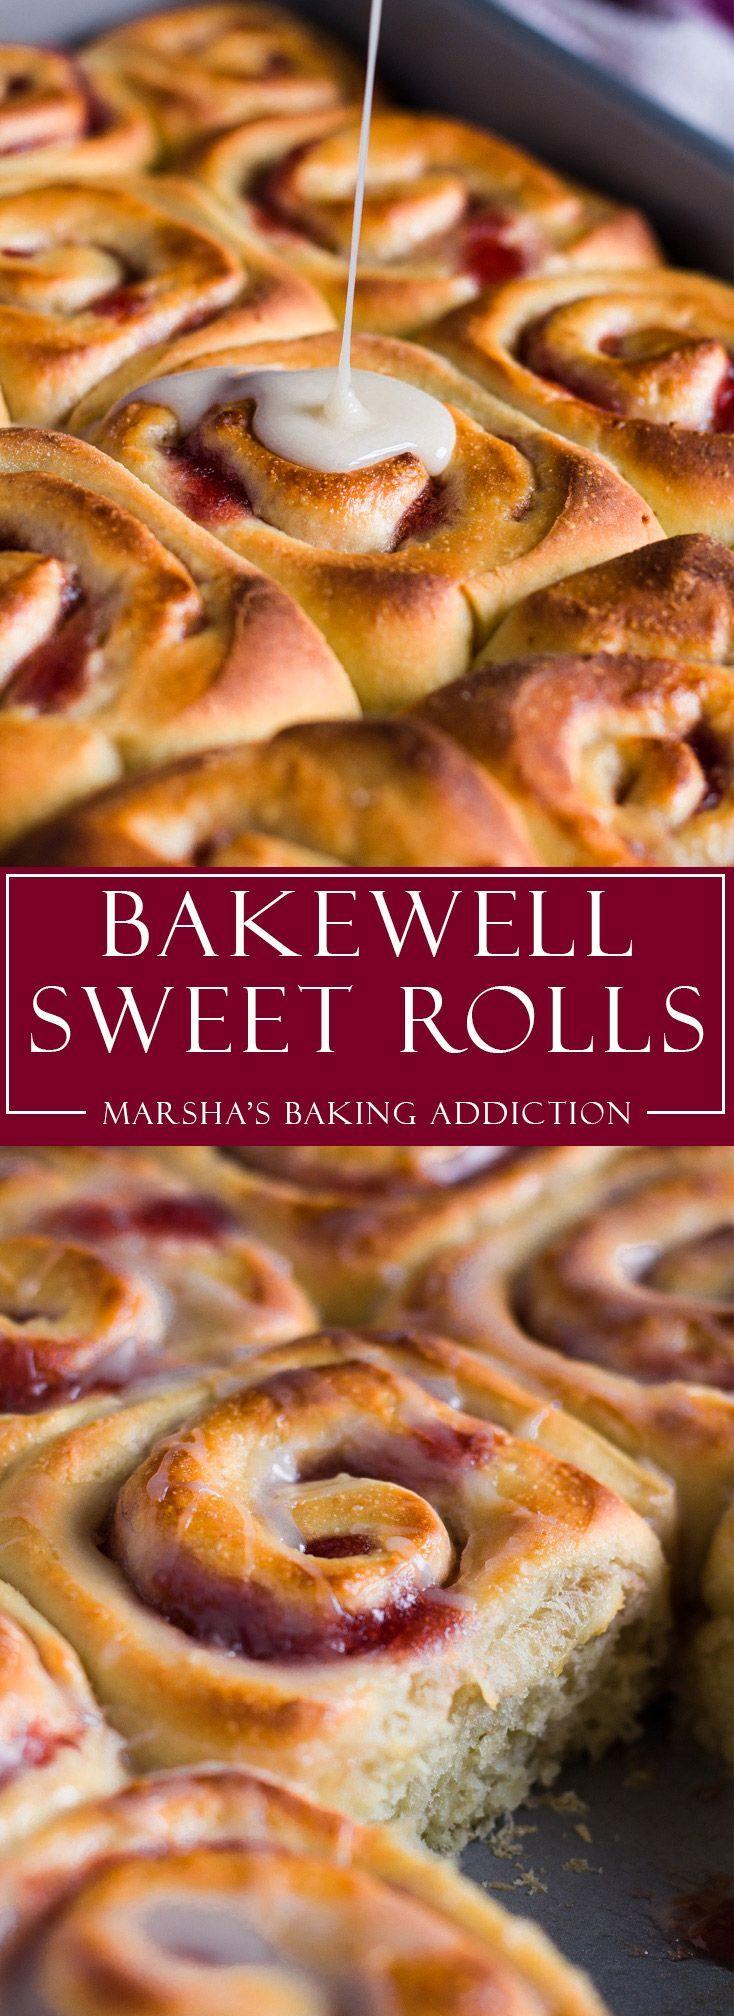 Bakewell Sweet Rolls   http://marshasbakingaddiction.com /marshasbakeblog/